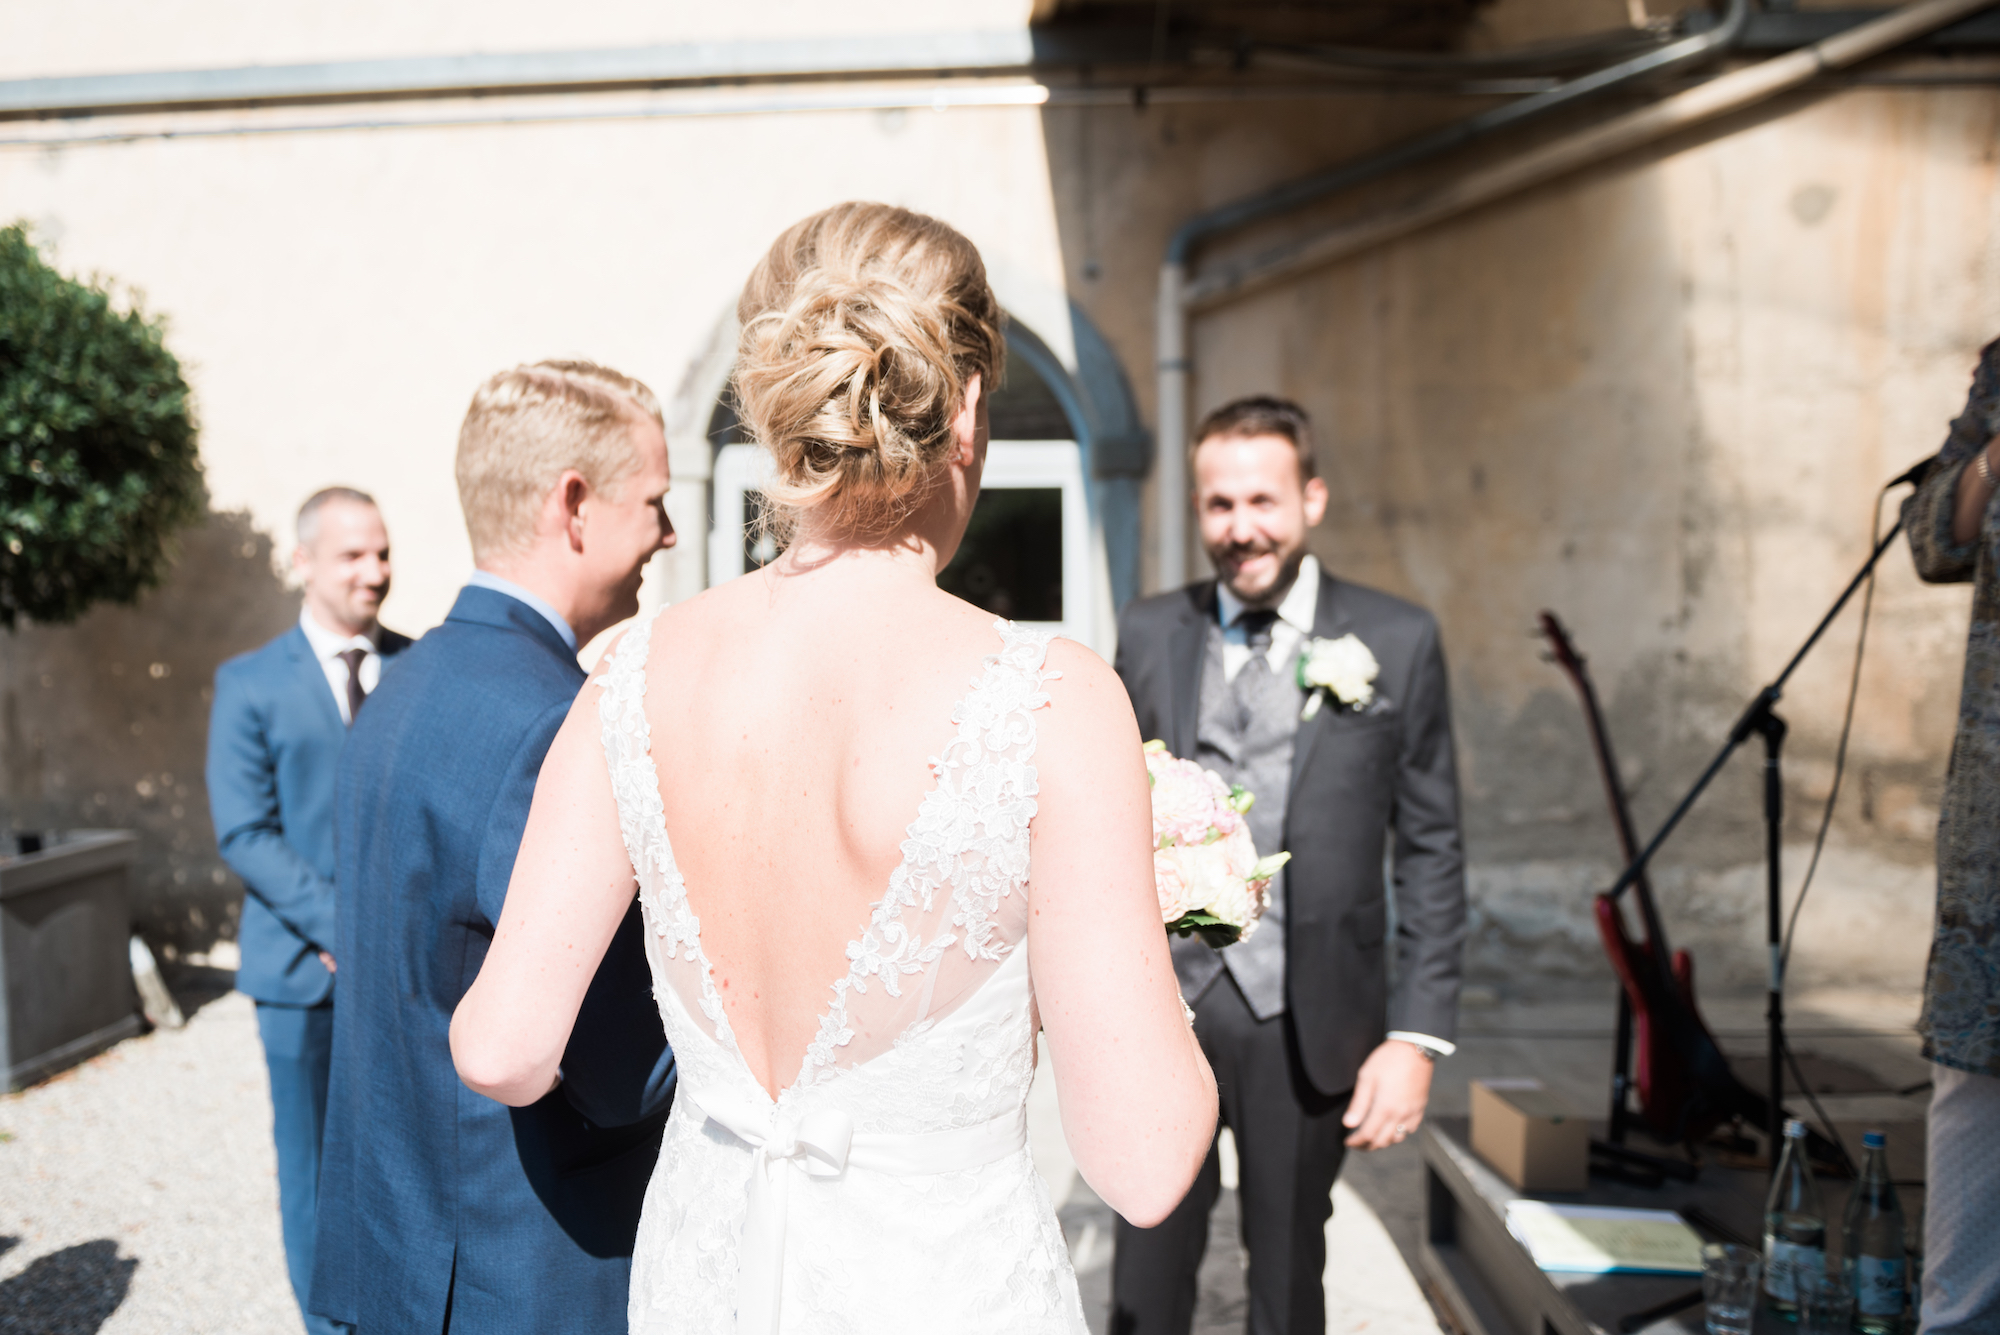 NadiaundMichael_Hochzeit_BekaBitterliFotografie_191.jpg